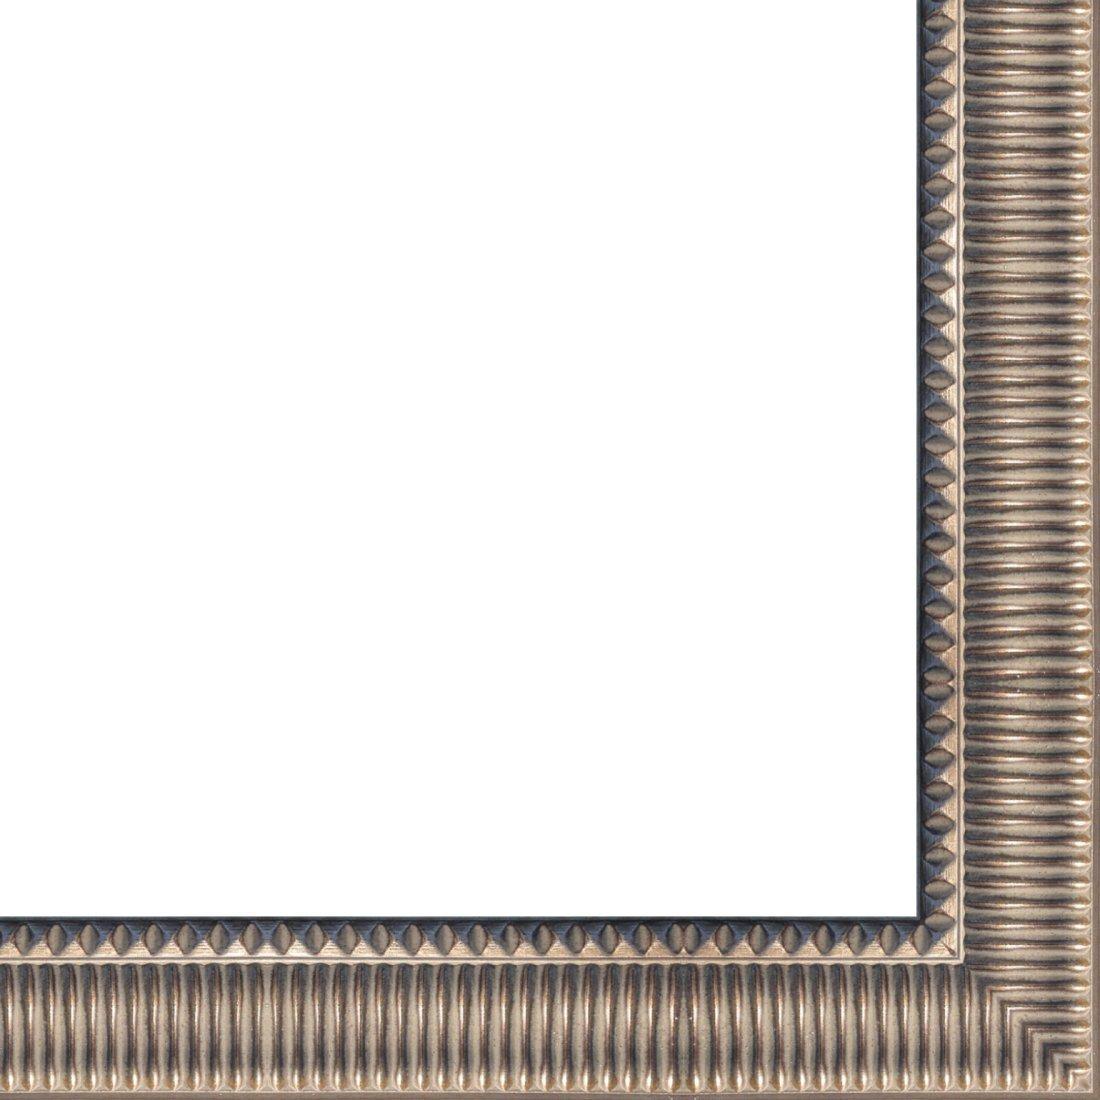 Picture Frame Moulding (Wood) 18ft bundle - Contemporary Antique Silver Finish - 3'' width - 5/8'' rabbet depth